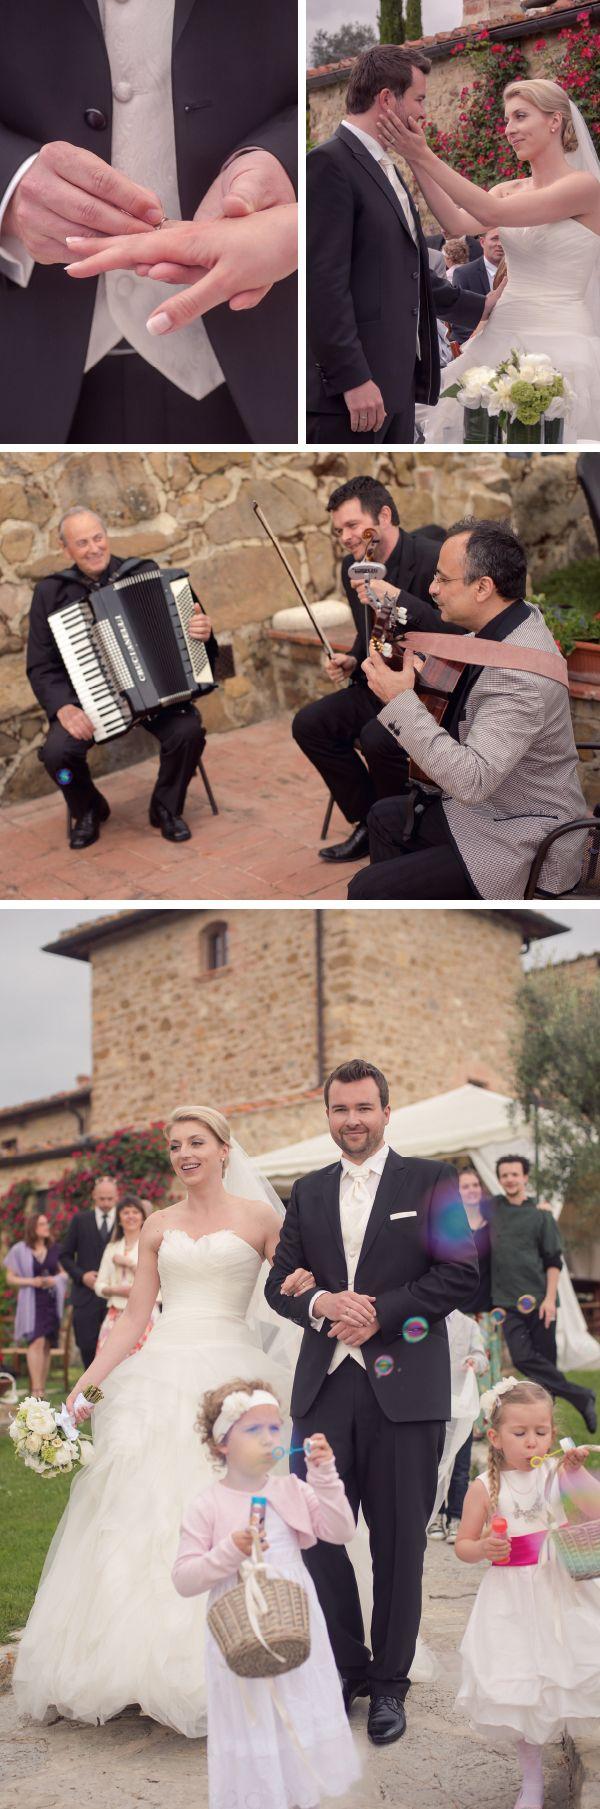 Outdoor wedding celebration with wedding music. / Eure Trauung unter freien Himmel / Trouwen in de open lucht in Toscane. - www.conamore.it   © Susi Nagele (Hochzeitsfotografie - Wedding Photographer - Bruiloftsfotografie - Flowers www.jardindivers.it).